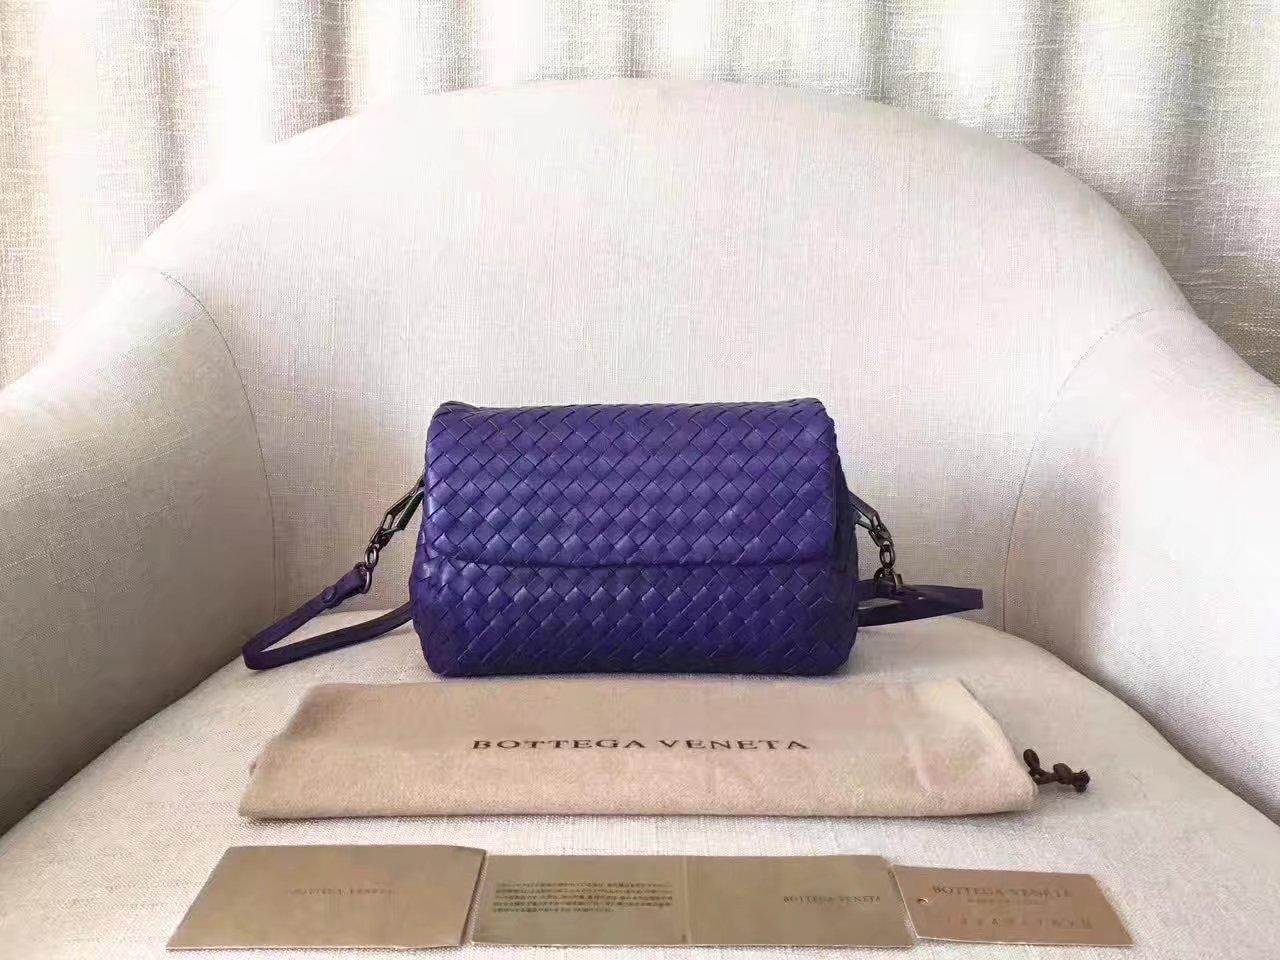 Bottega Veneta Baby Olimpia Bag in Glicine Intrecciato Nappa Leather Blue